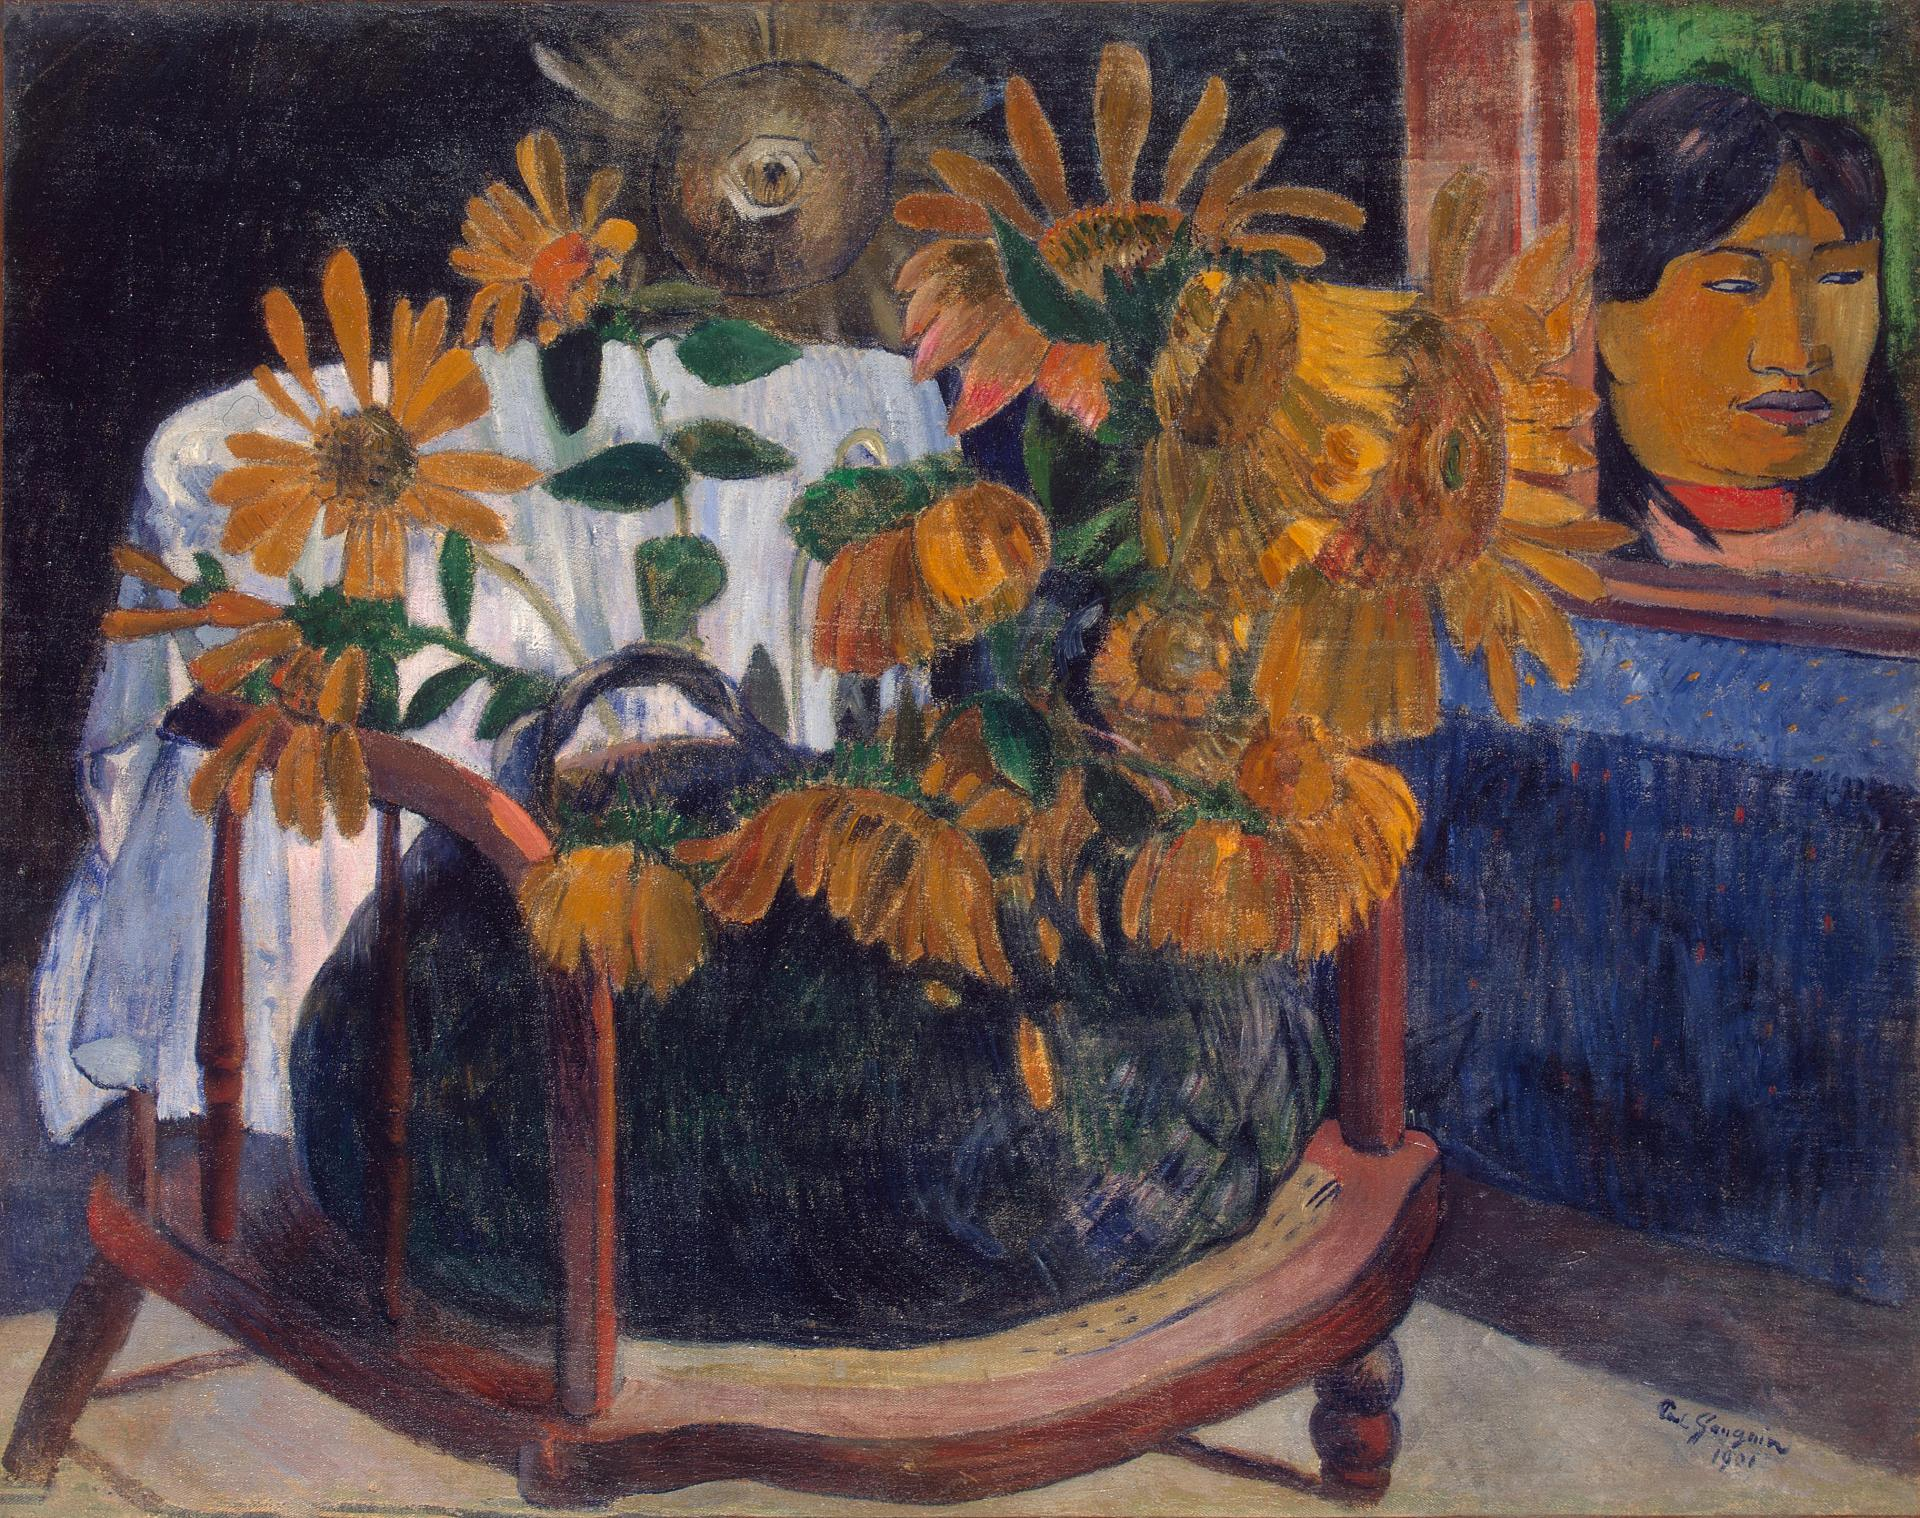 натюрморт - цветы Натюрморт с подсолнухами - Paul Gauguin фото